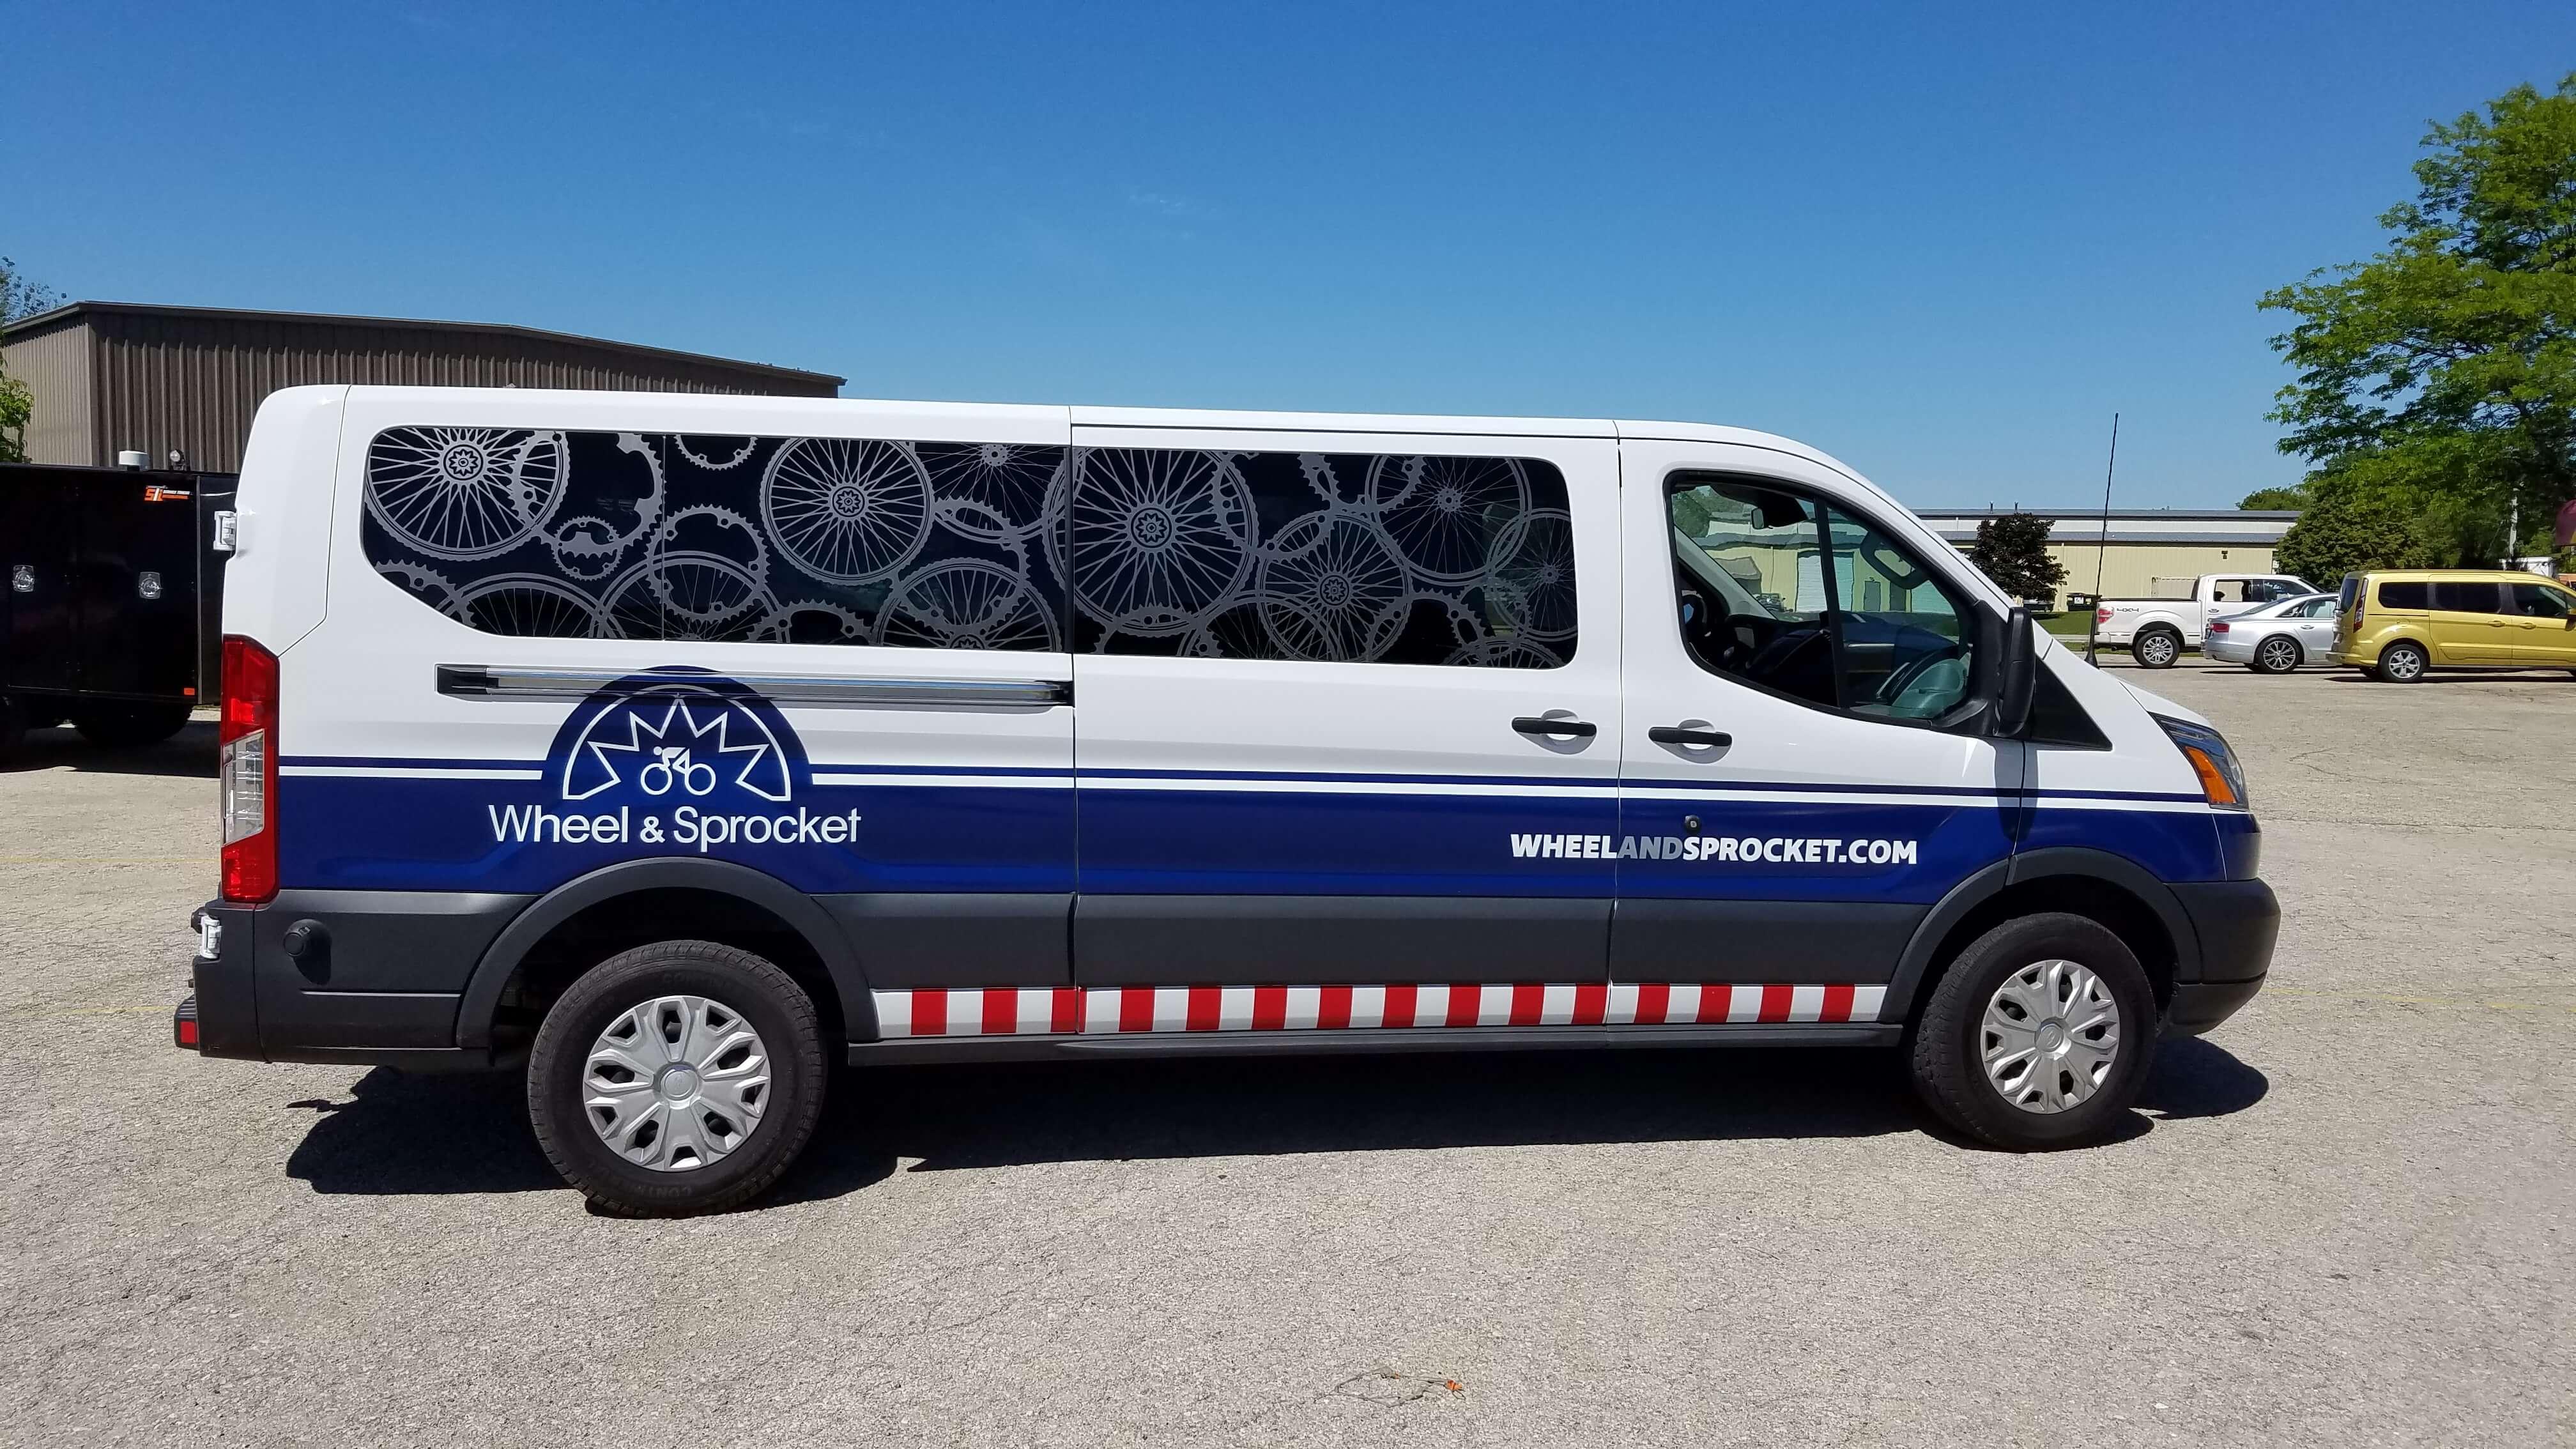 Wheel and Sprocket service vehicle full wrap